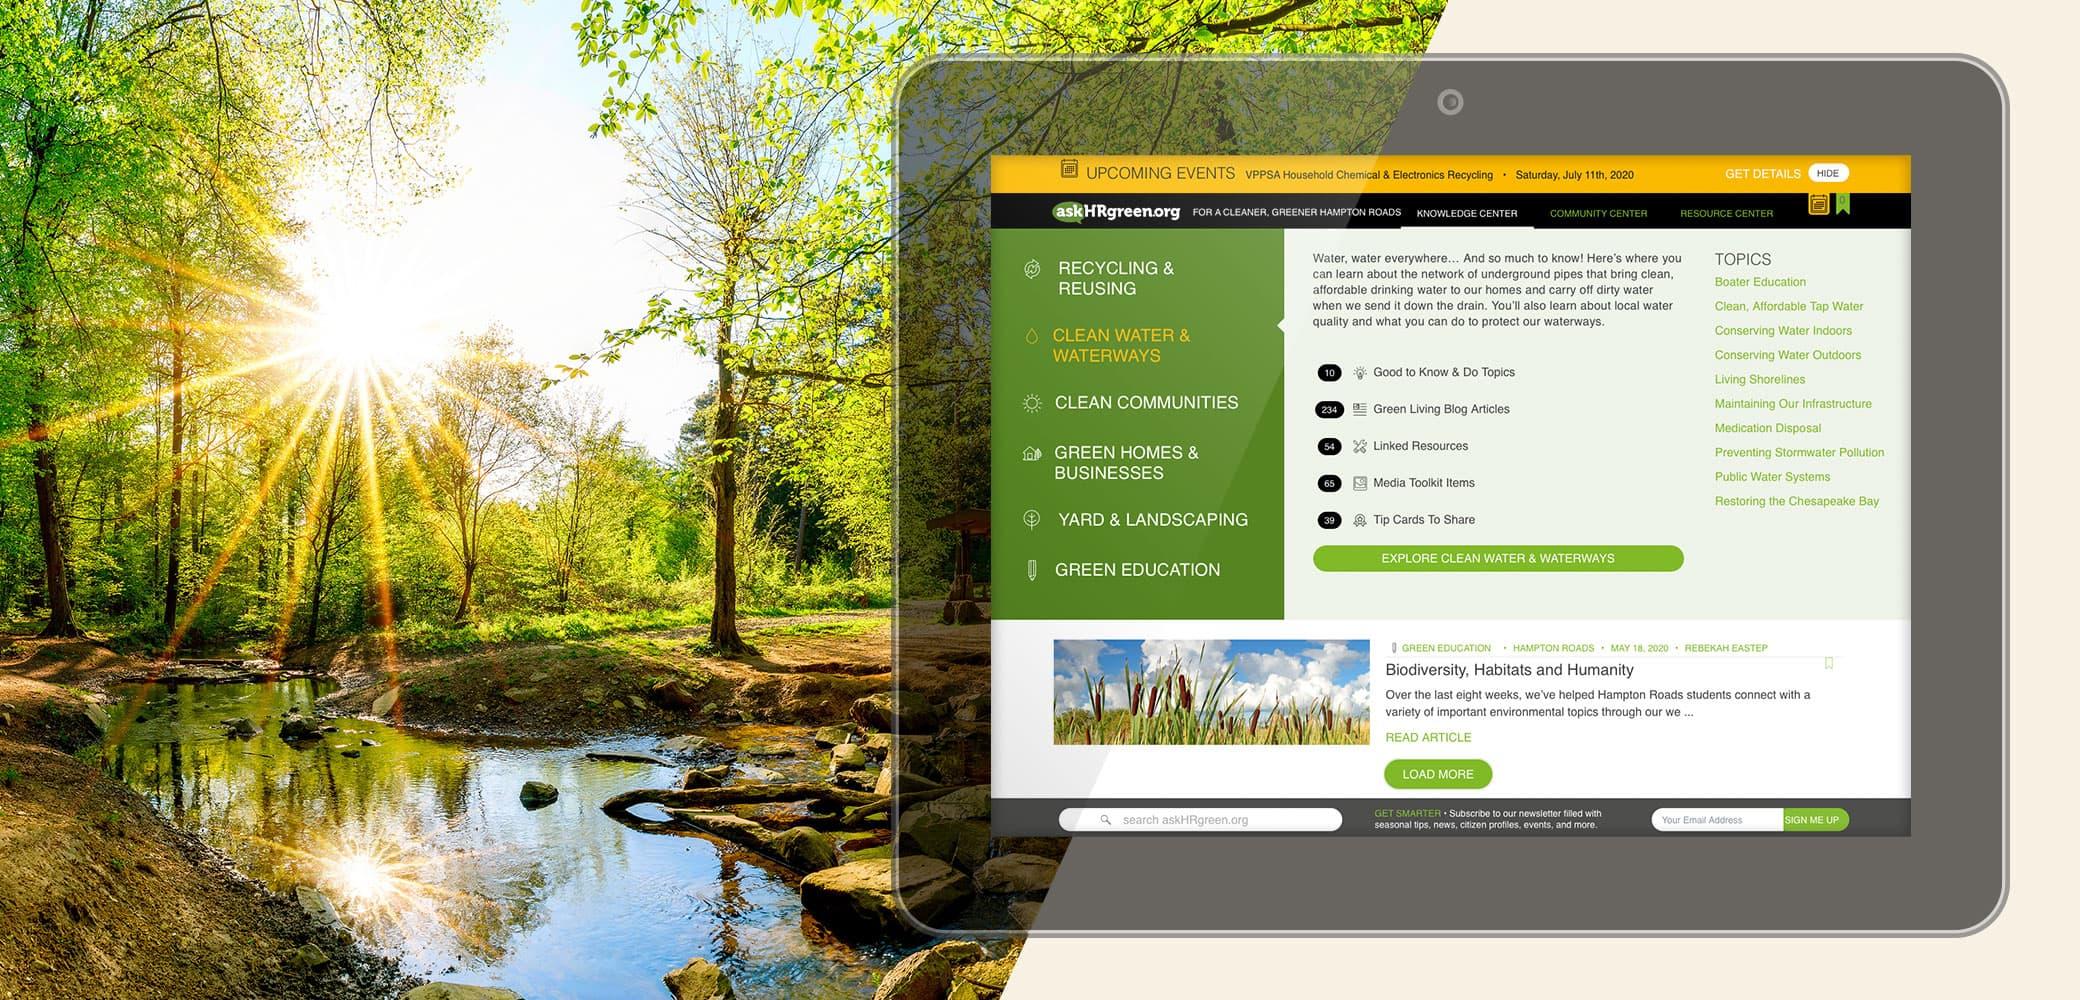 askHRgreen.org Website Strategy, Design & Development by Red Chalk Studios